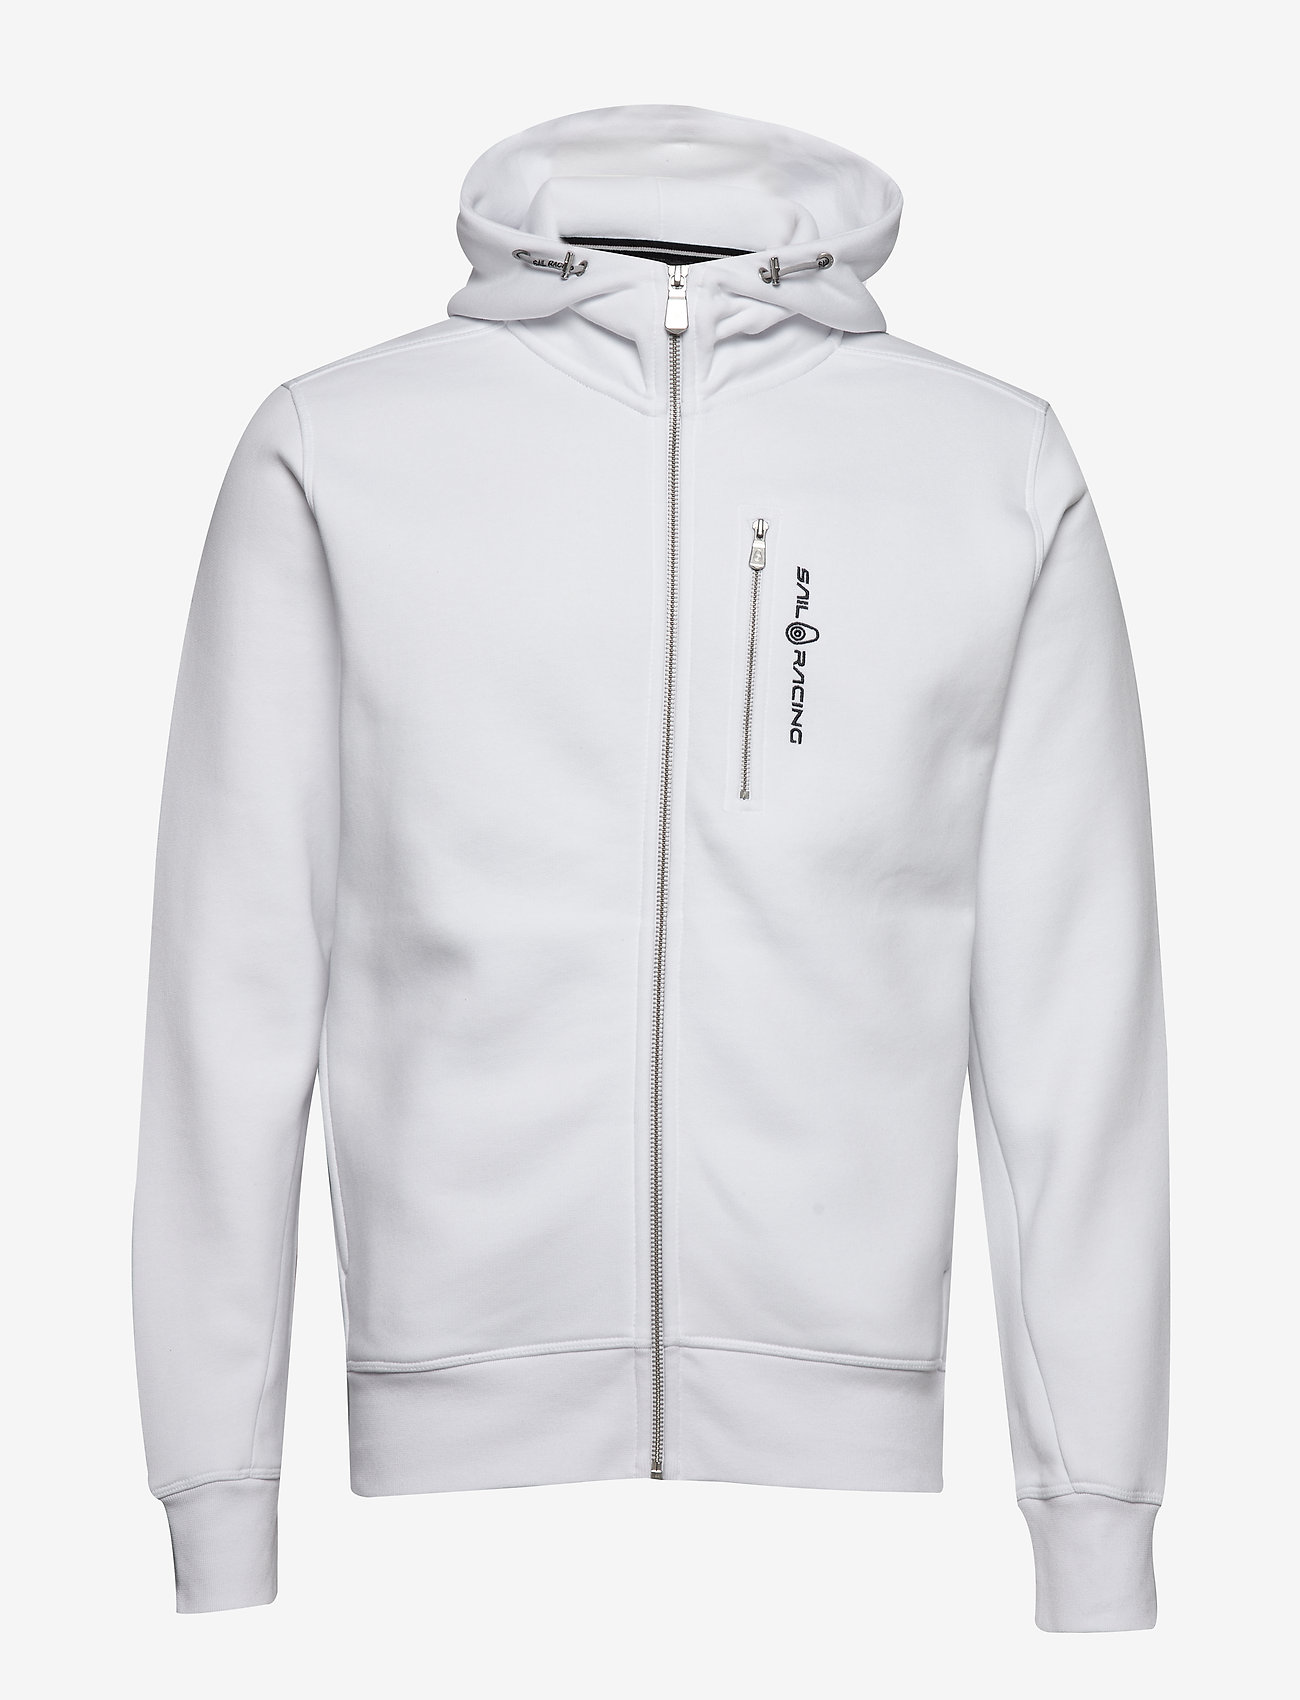 Sail Racing - BOWMAN ZIP HOOD - hoodies - white - 0